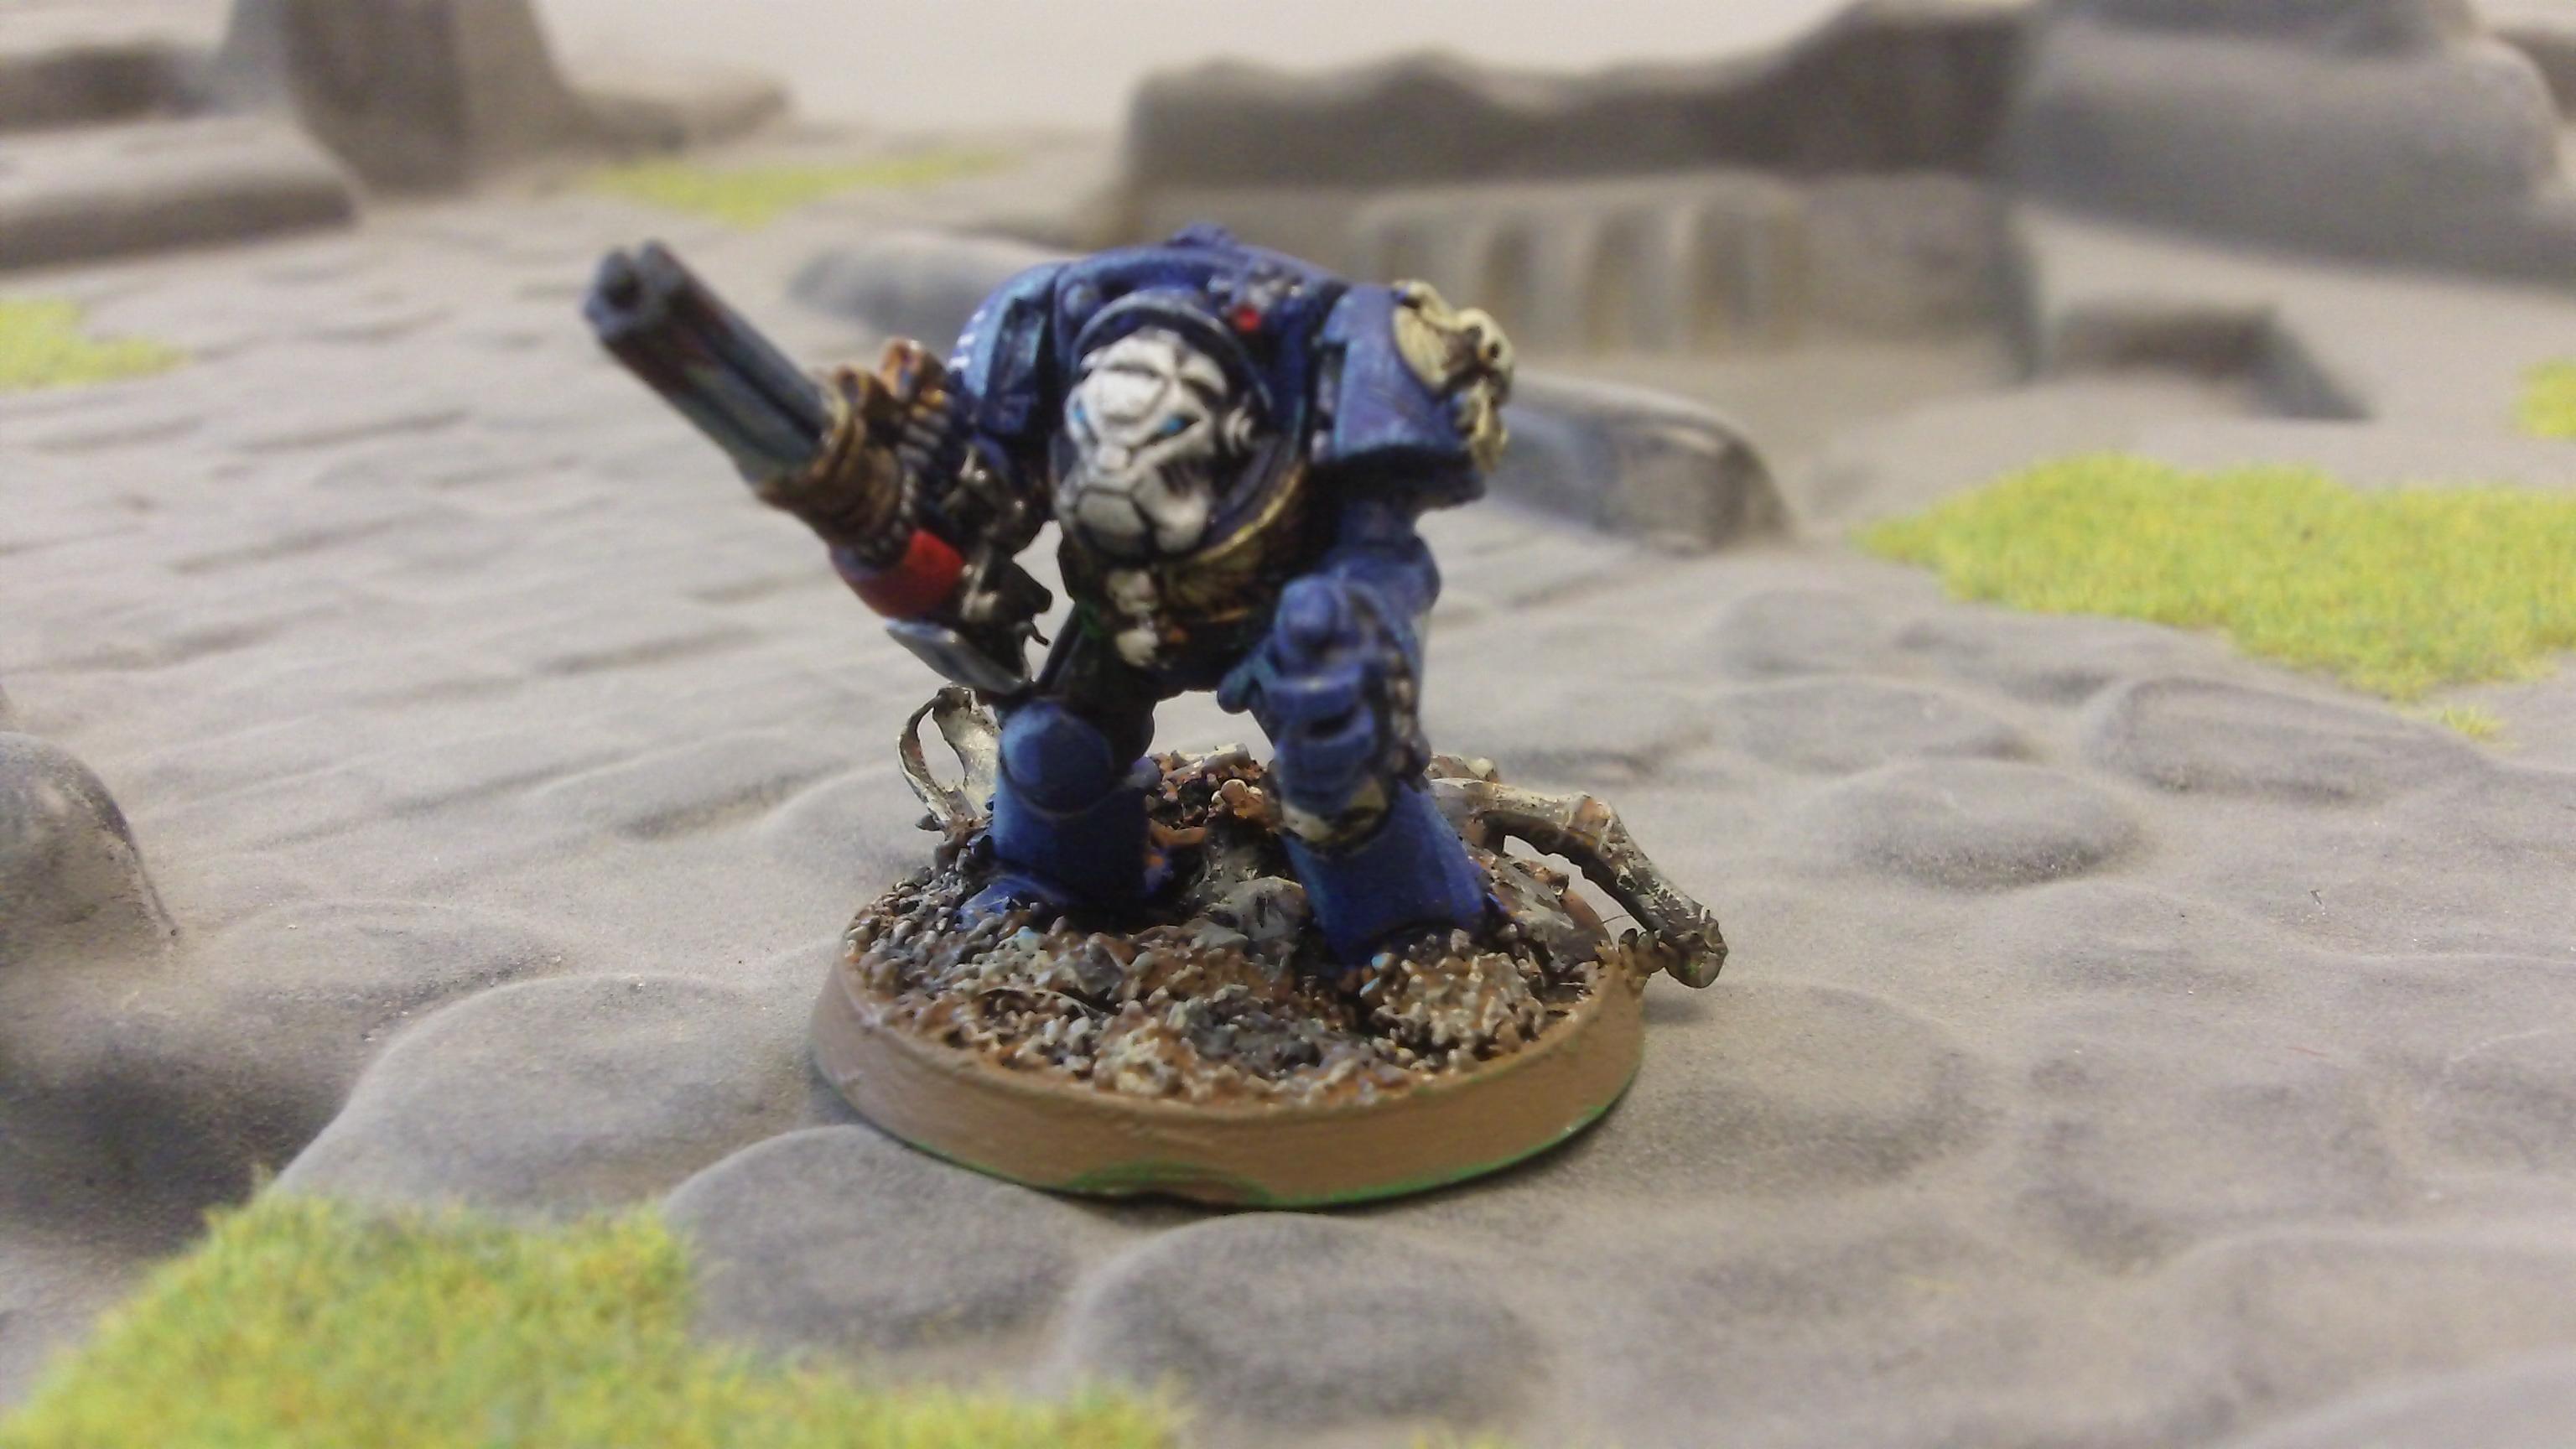 Knightfall, Knightfall Games, Miniatures, Space Marines, Terminator Armor, Ultra, Ultramarines, Warhammer 40,000, Warhammer Fantasy